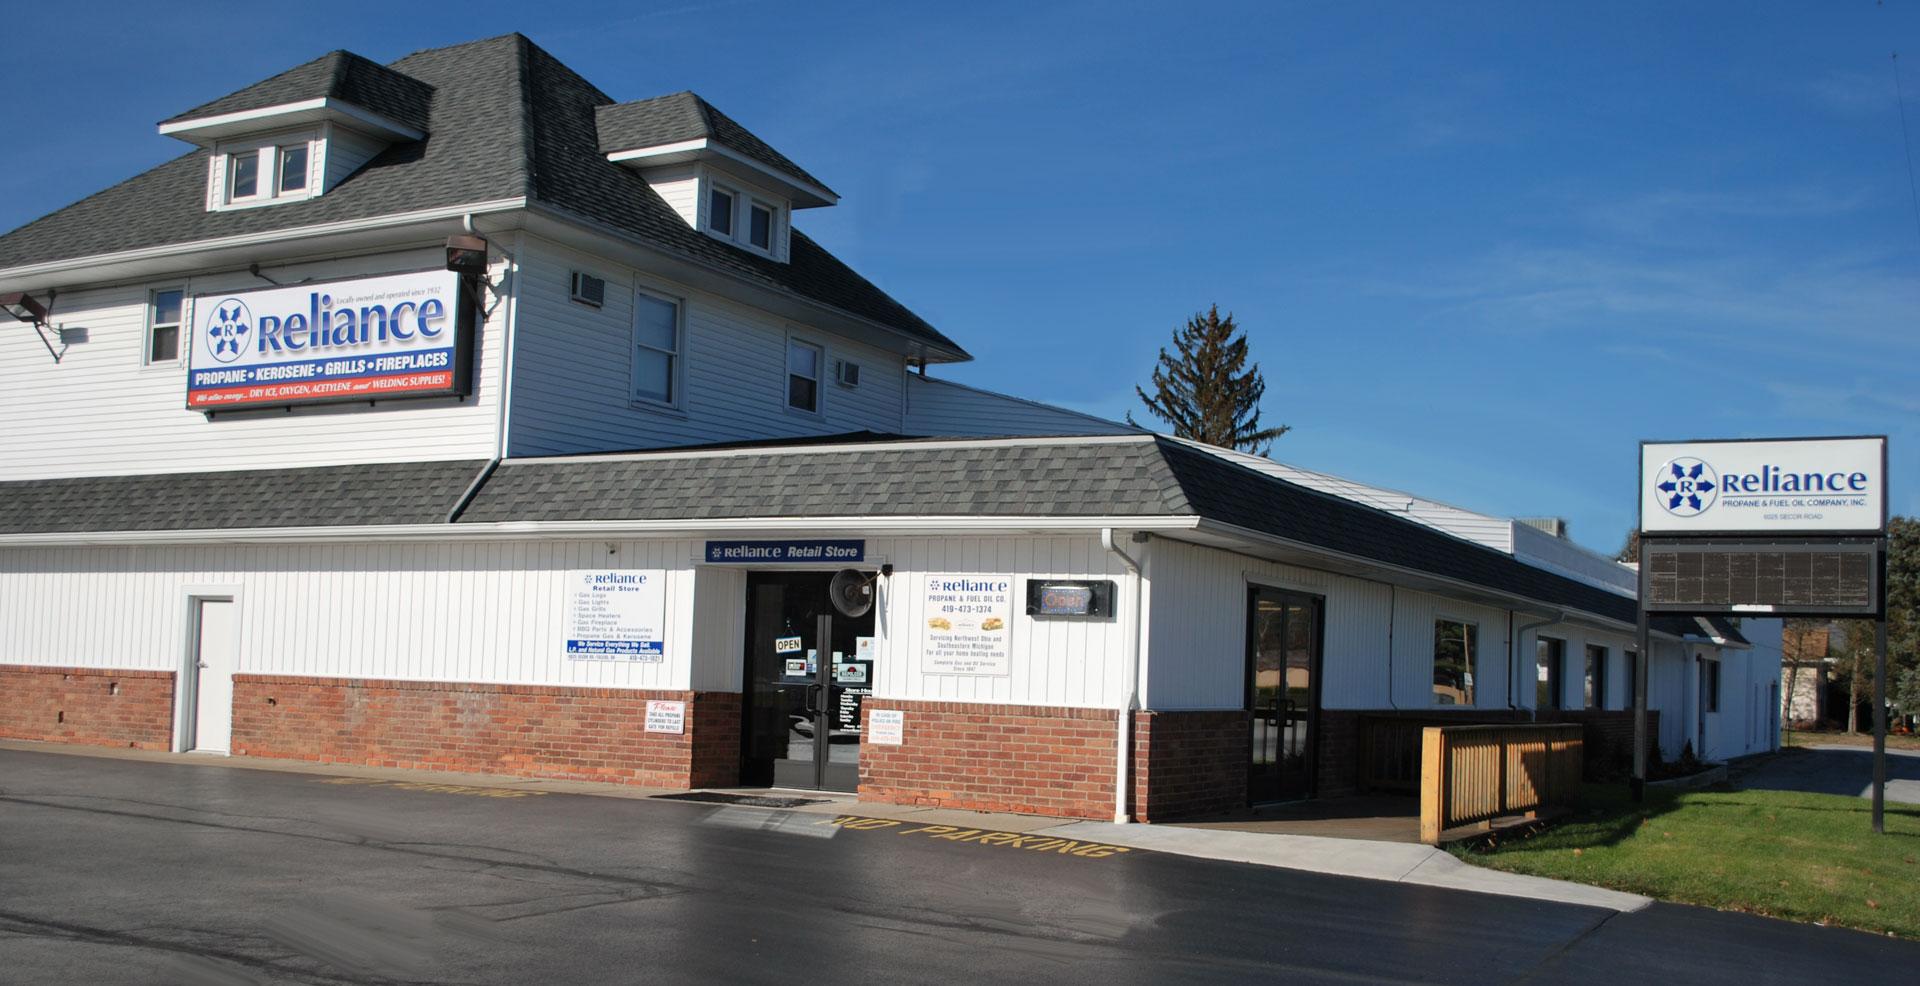 Reliance Propane & Fuel Oil Building